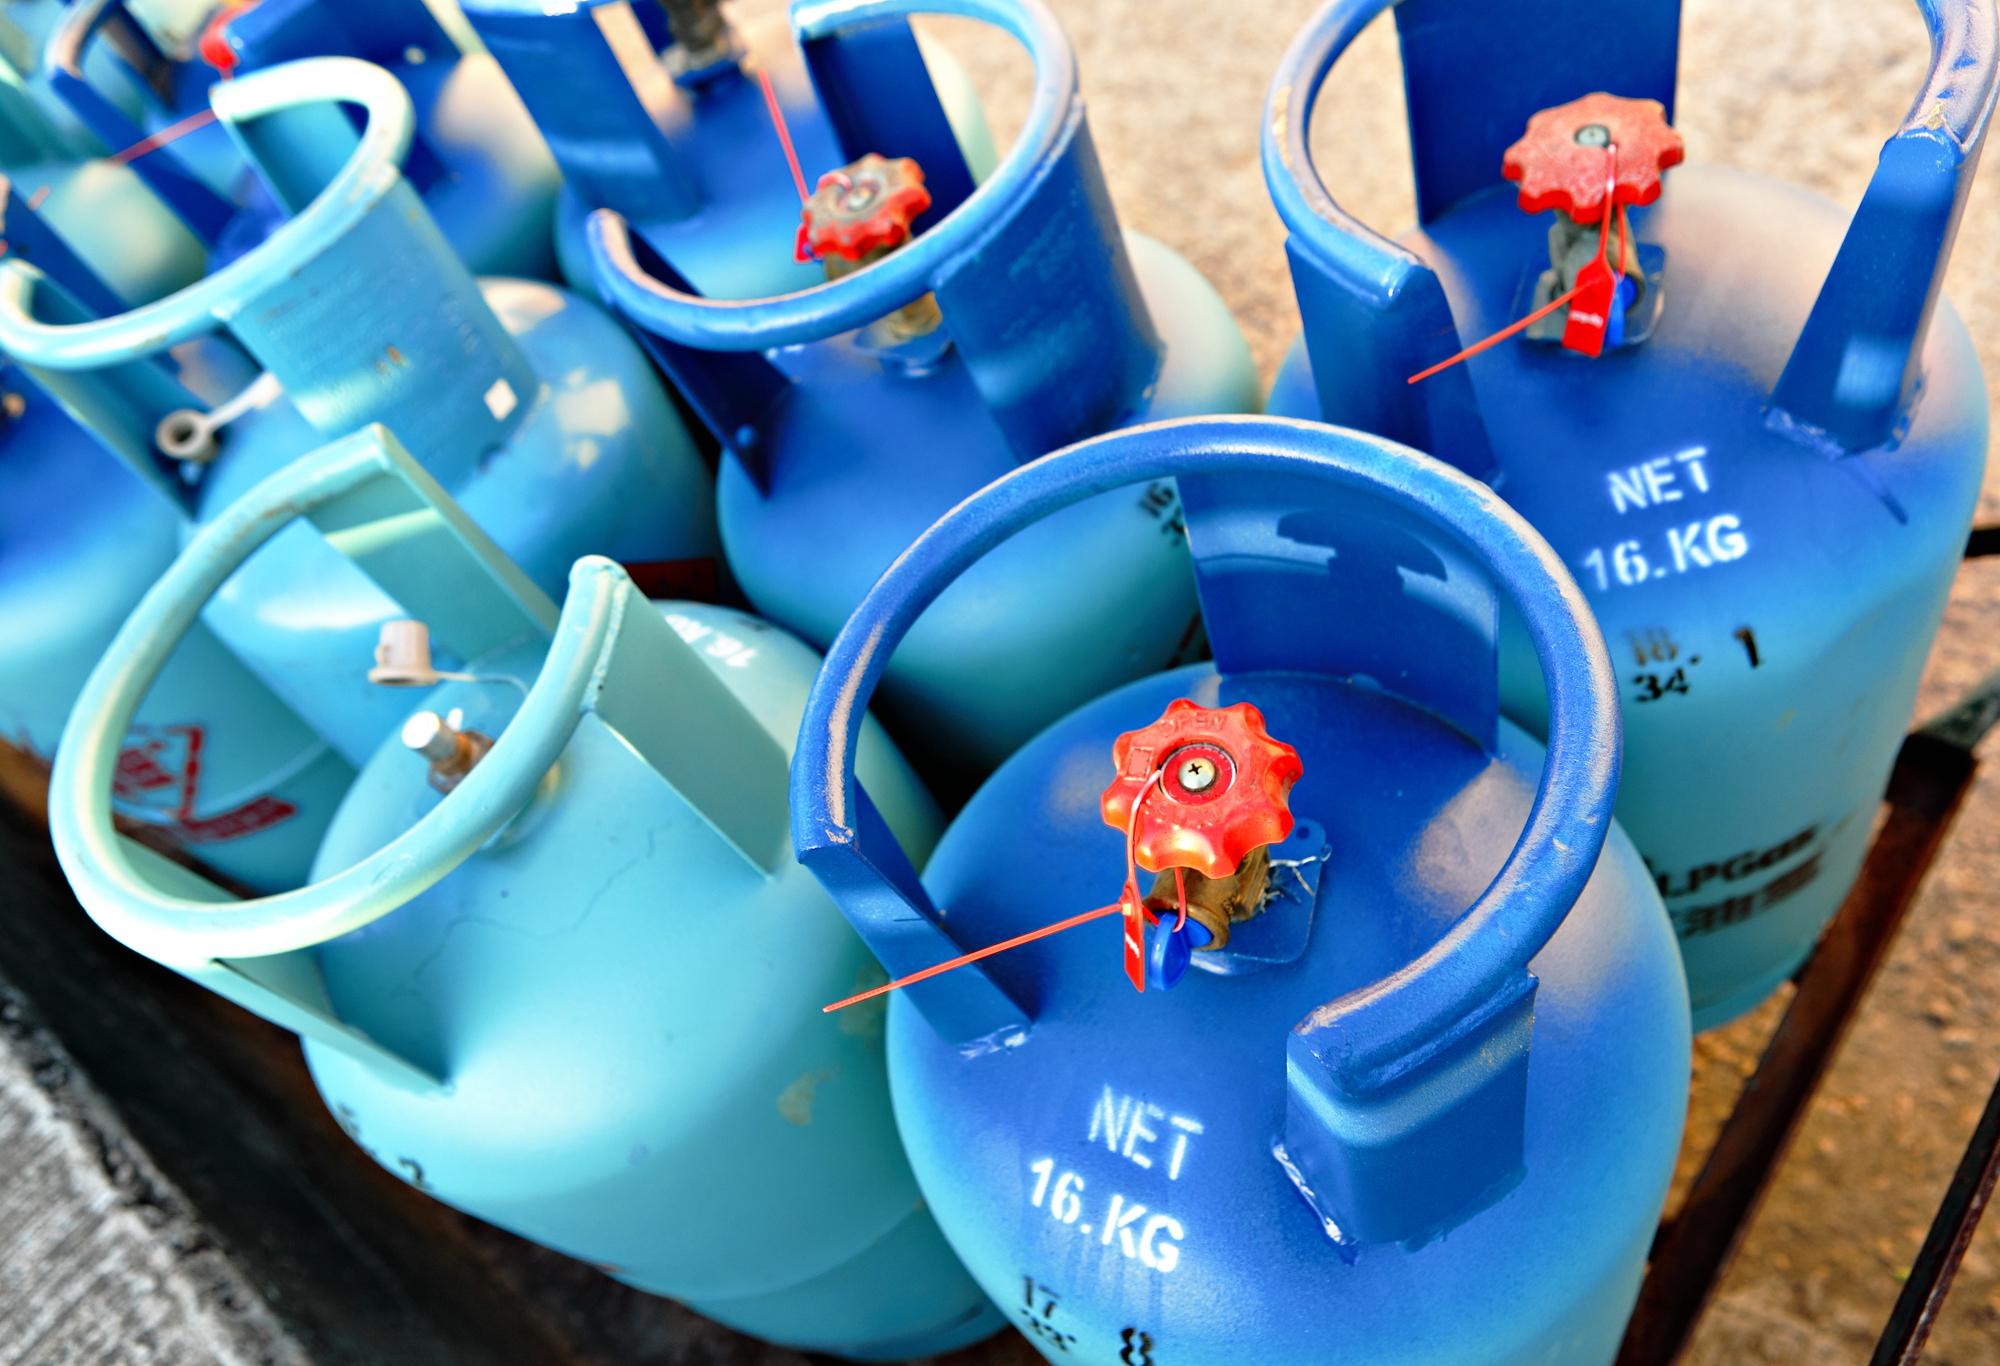 Propane gas tanks